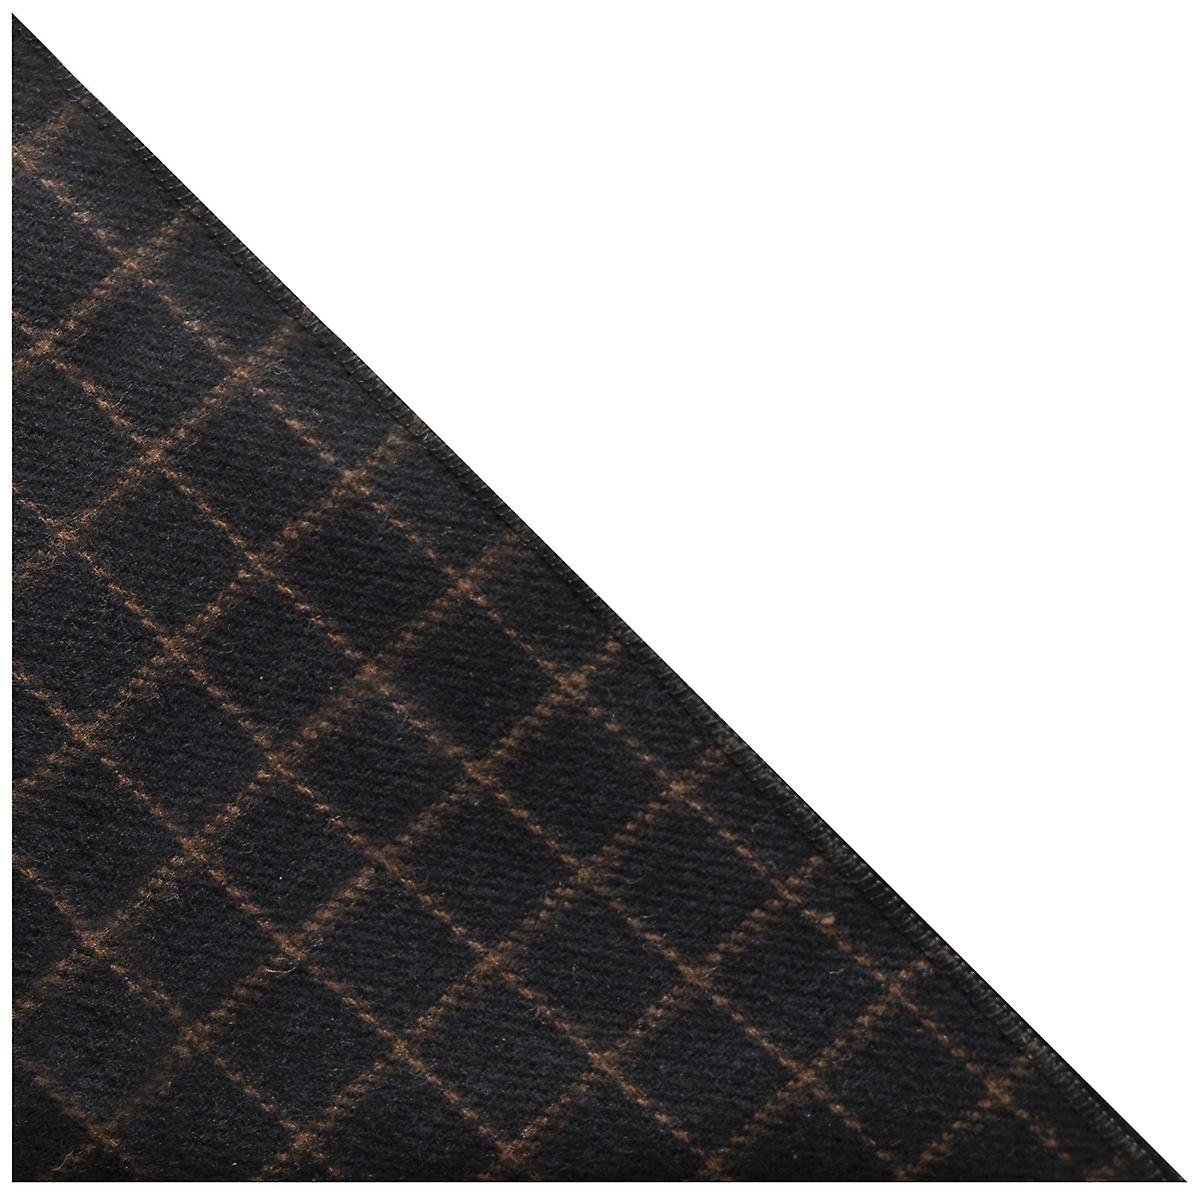 Luxury Oxford Blue Tattersall Check Tweed Pocket Square, Handkerchief